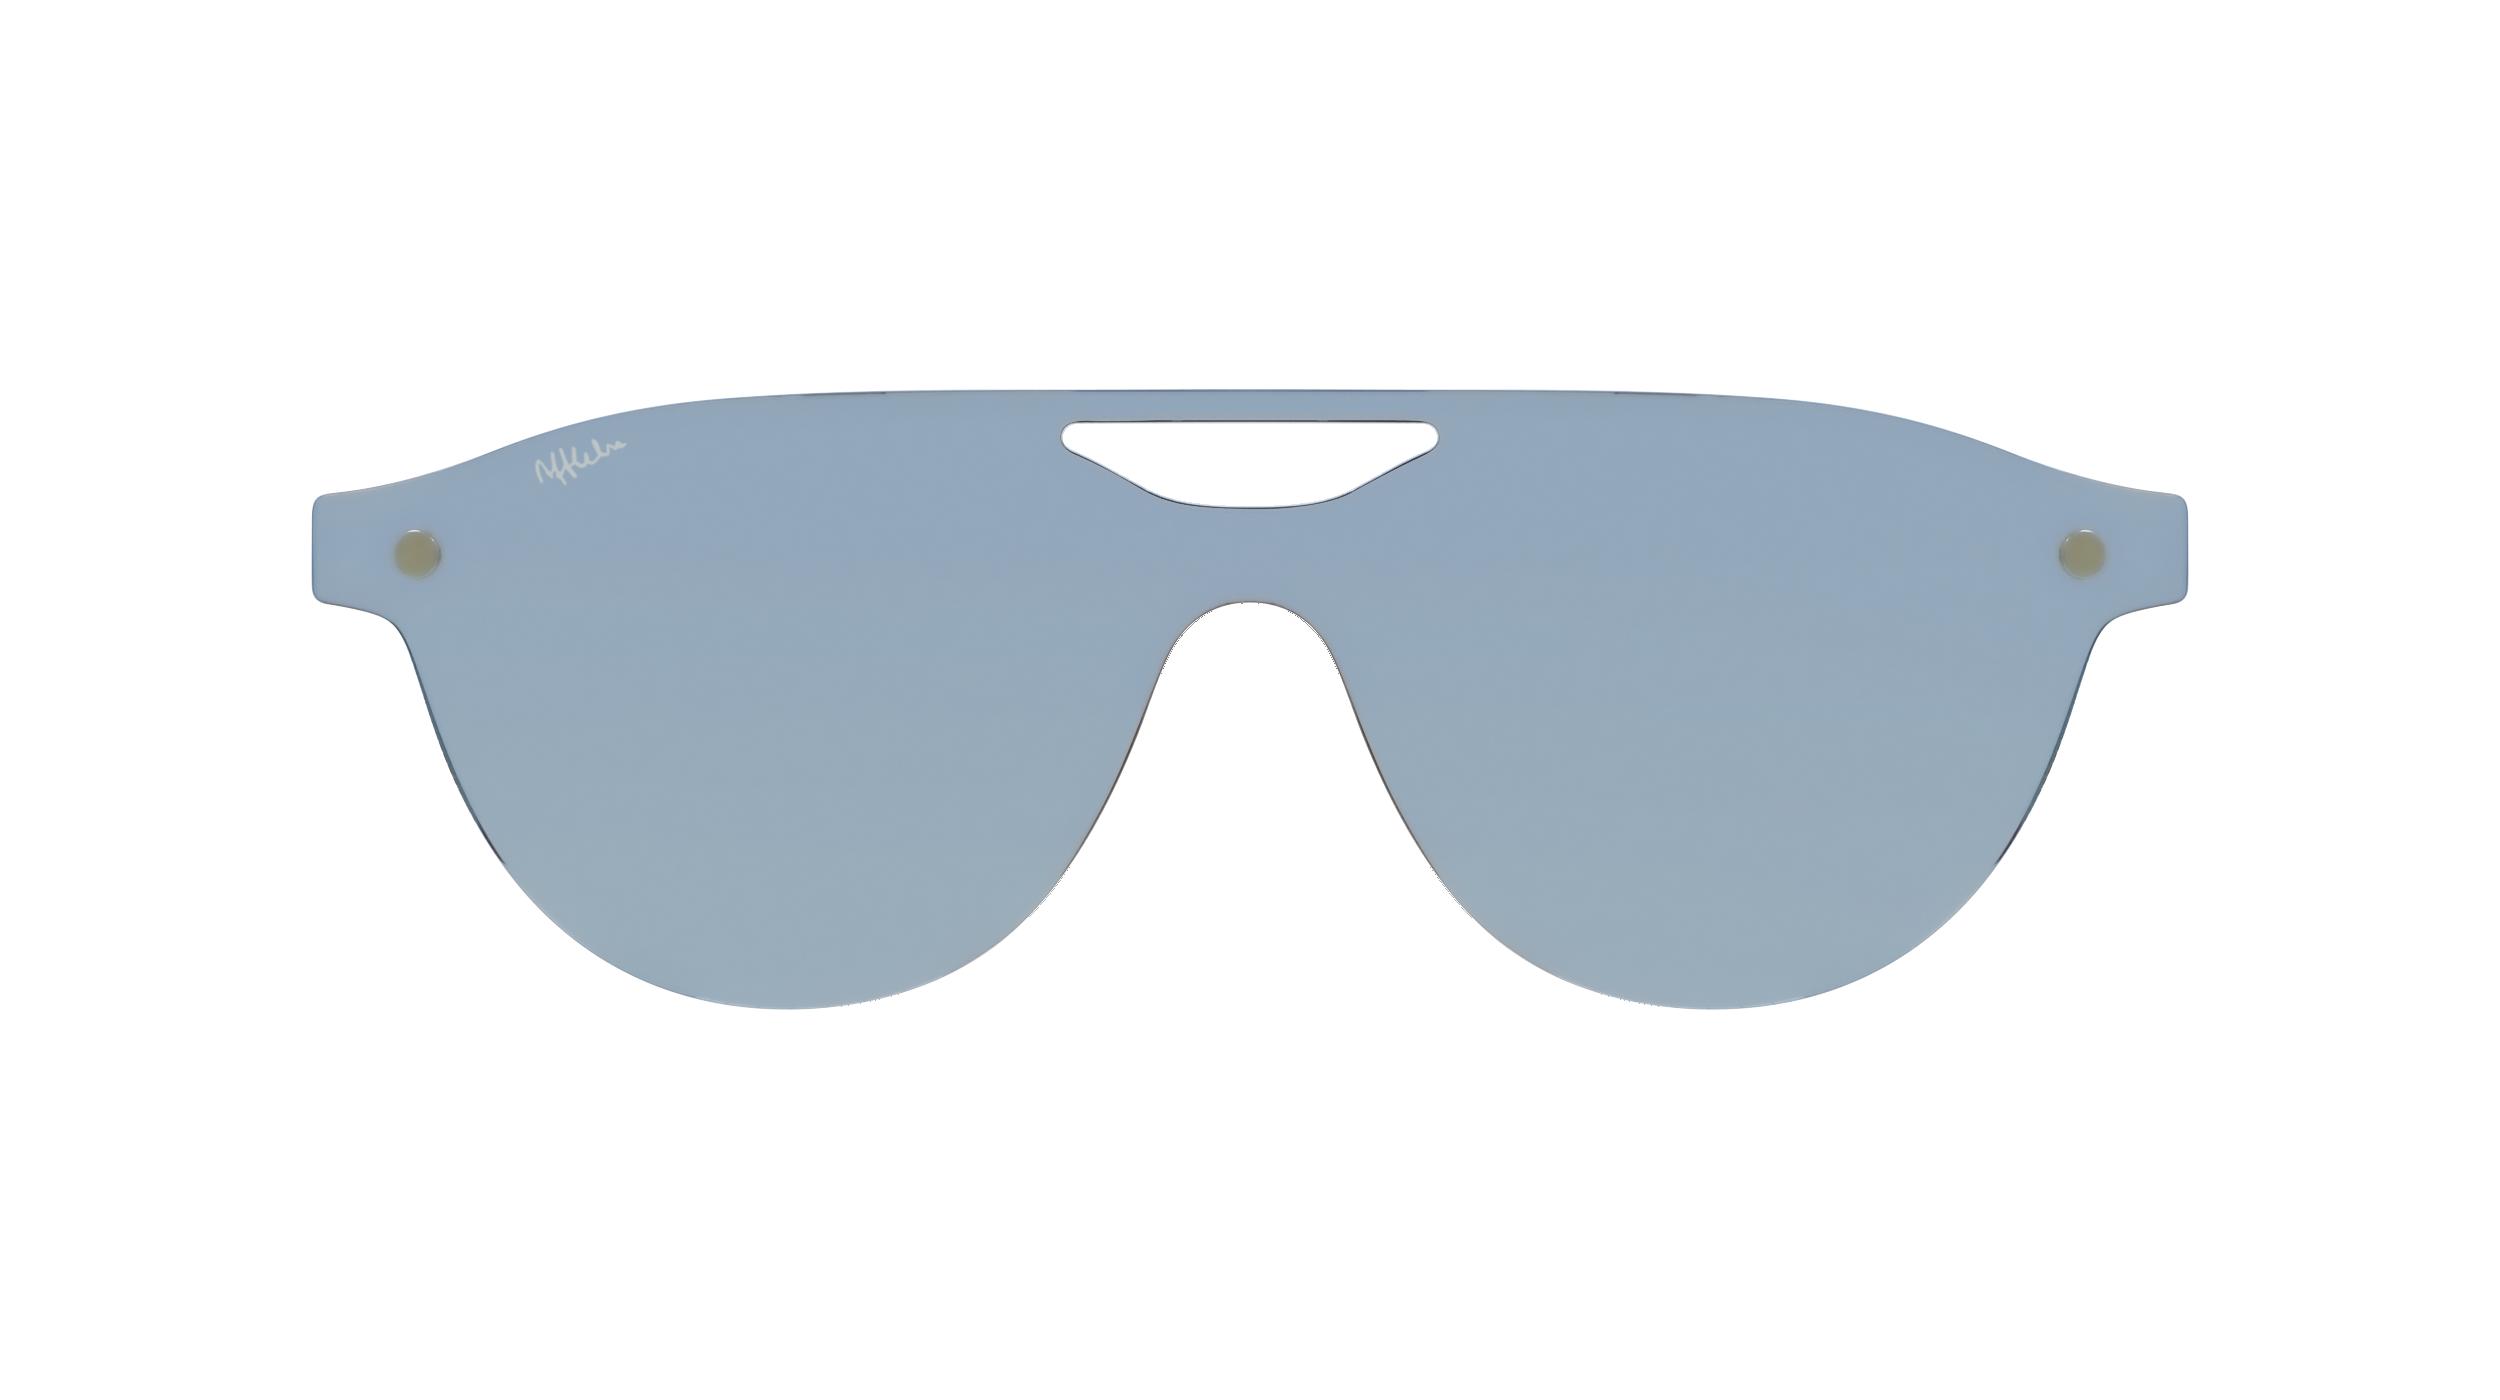 afflelou/france/products/smart_clip/clips_glasses/07630036452912.png